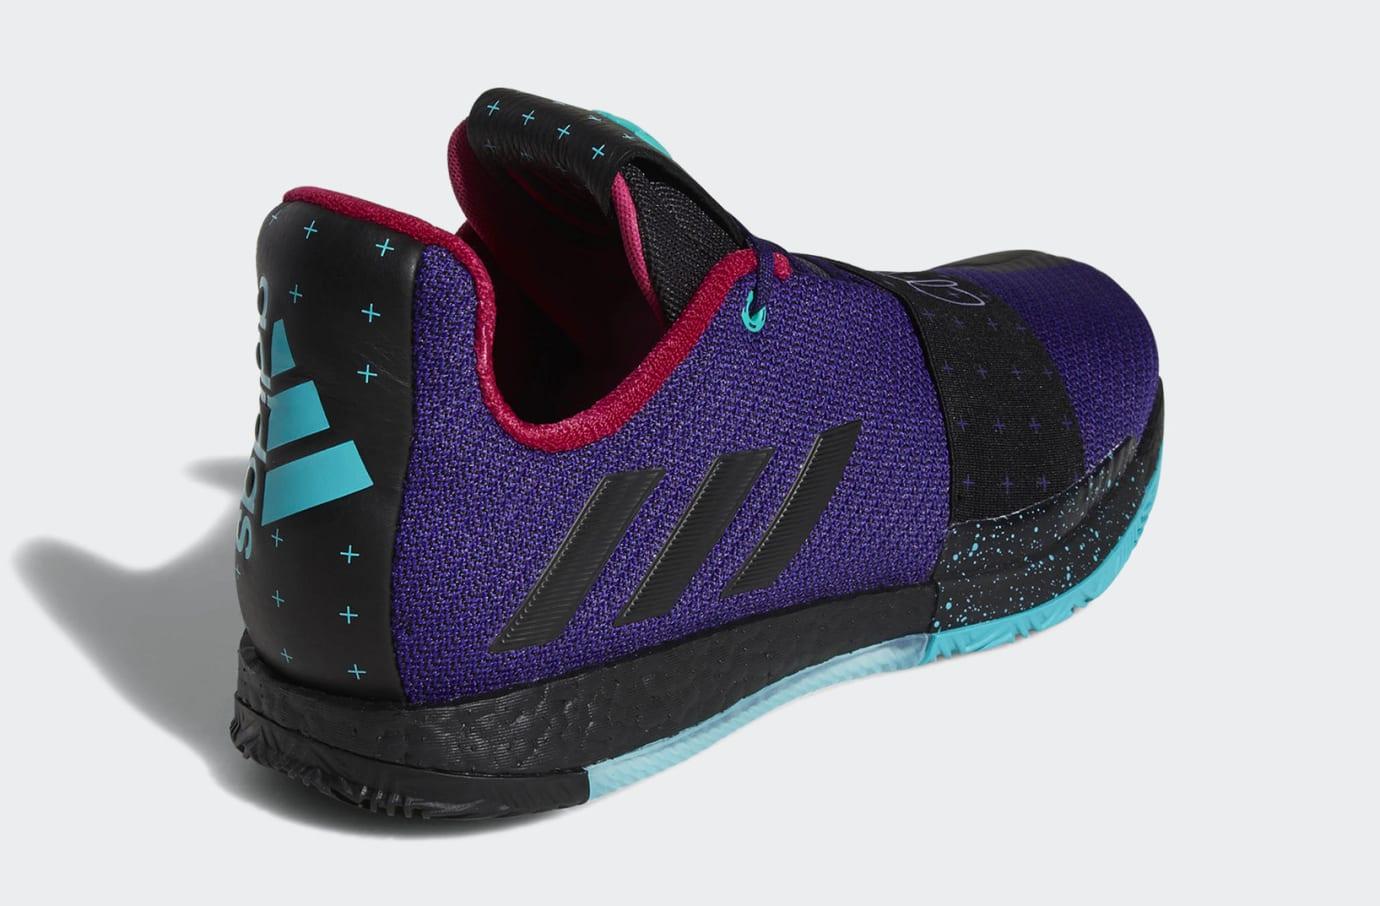 official photos ed072 99ece Image via Adidas adidas-harden-vol-3-drew-league-b42005-heel